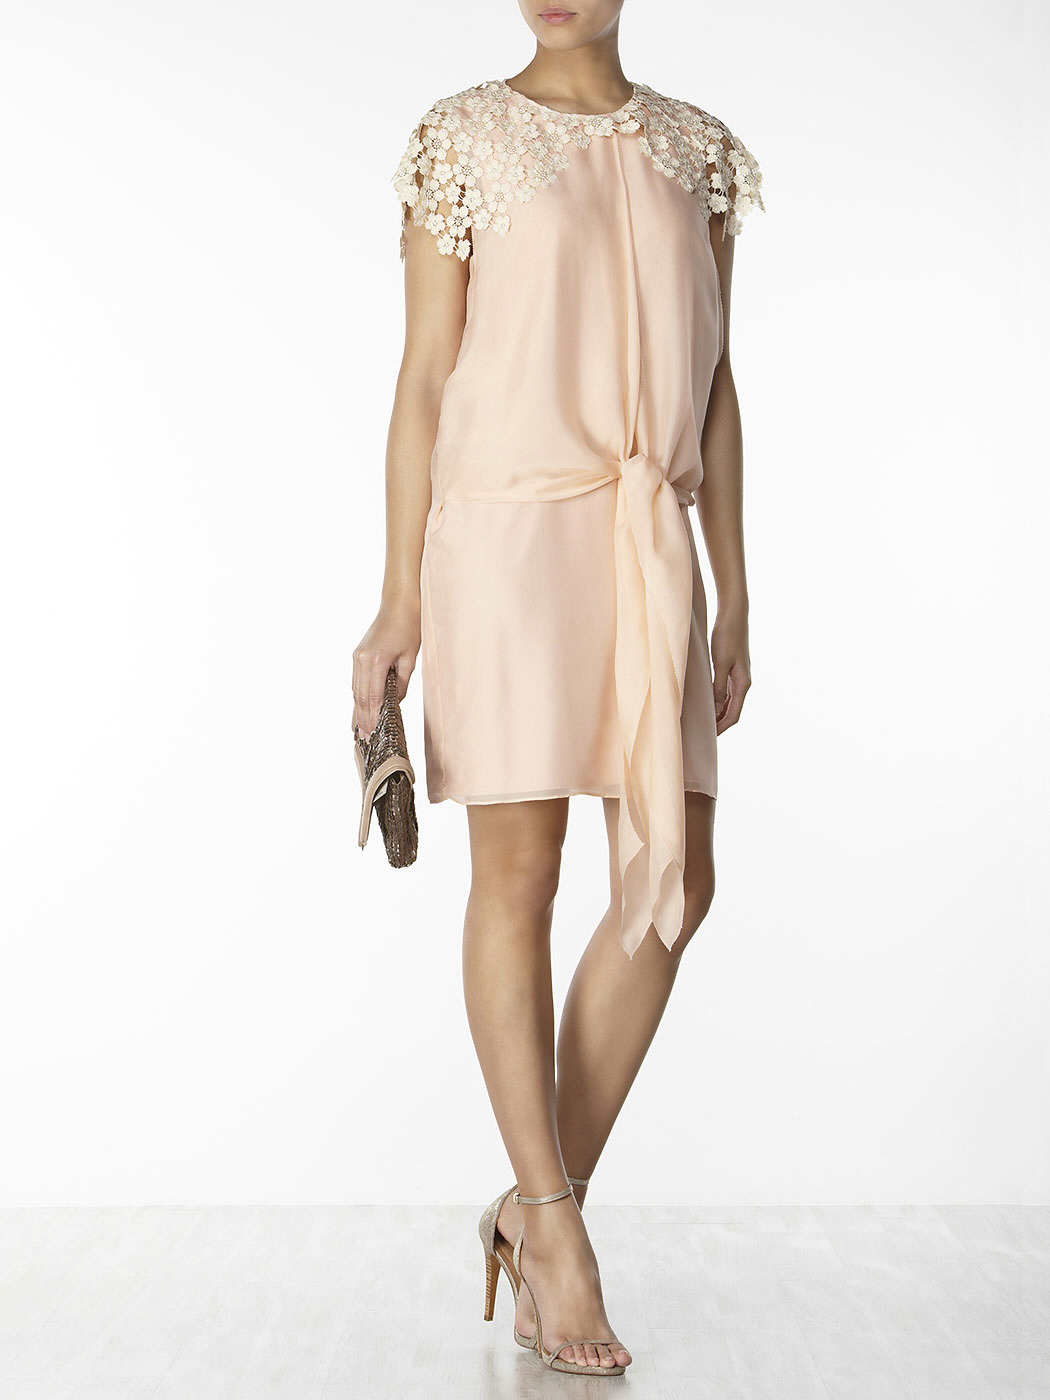 Impresionantes vestidos cortos para fiestas, moda 2014